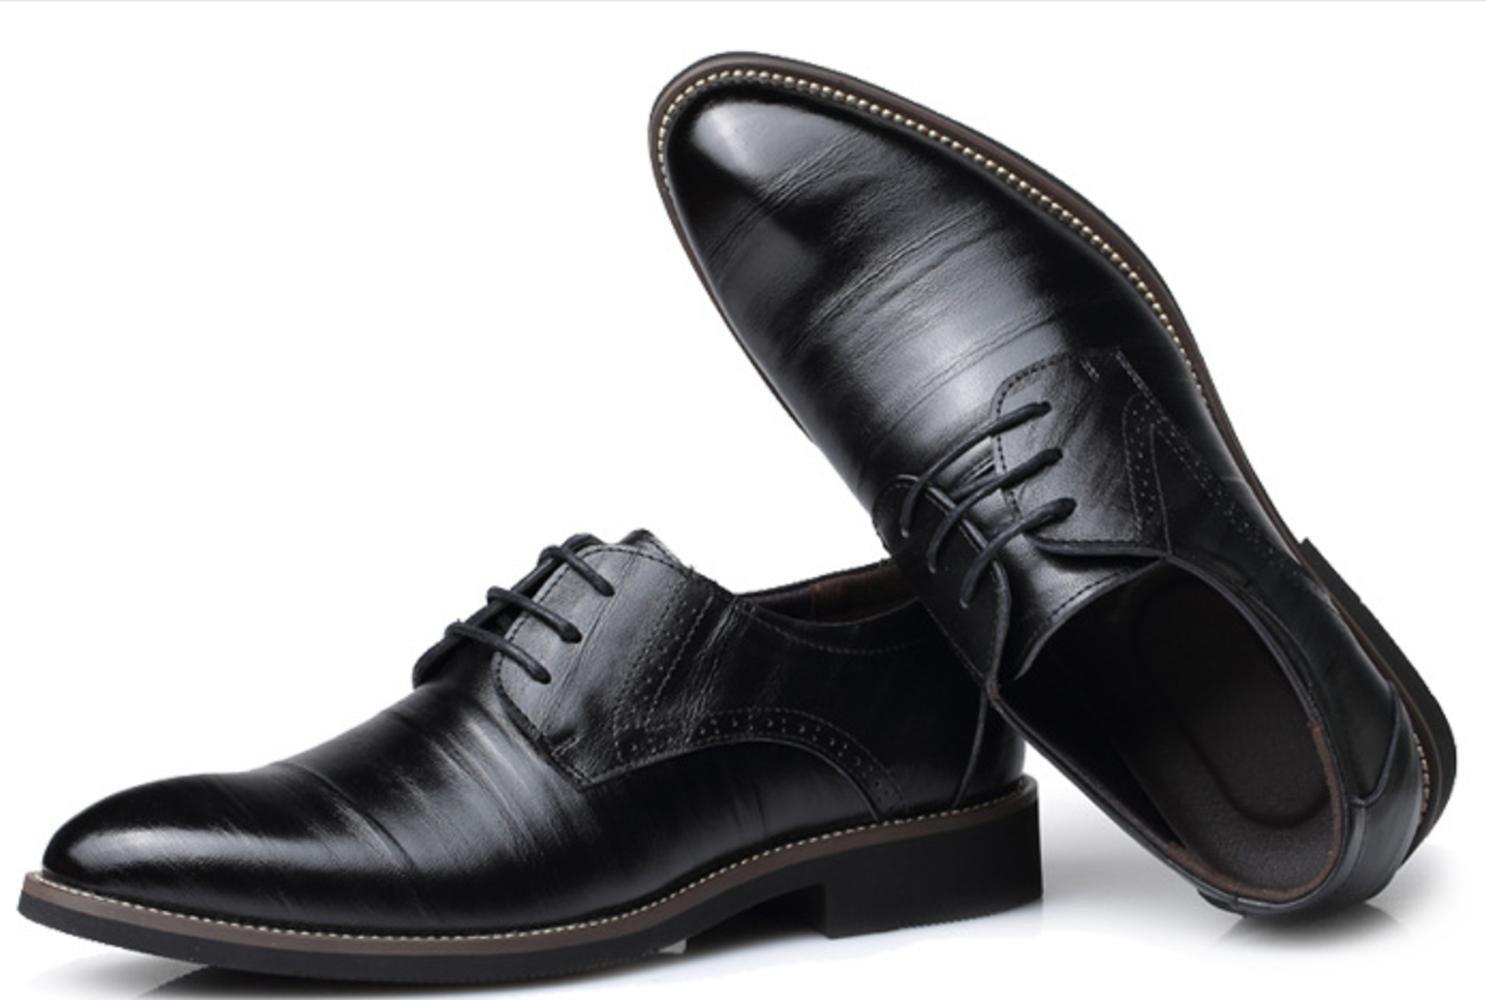 XDGG Männer Leder Schuhe Geschäft Casual Spitz Groß Zehe Hochzeit Schuhe Groß Spitz Größe Schuhe , 47 - 5066df